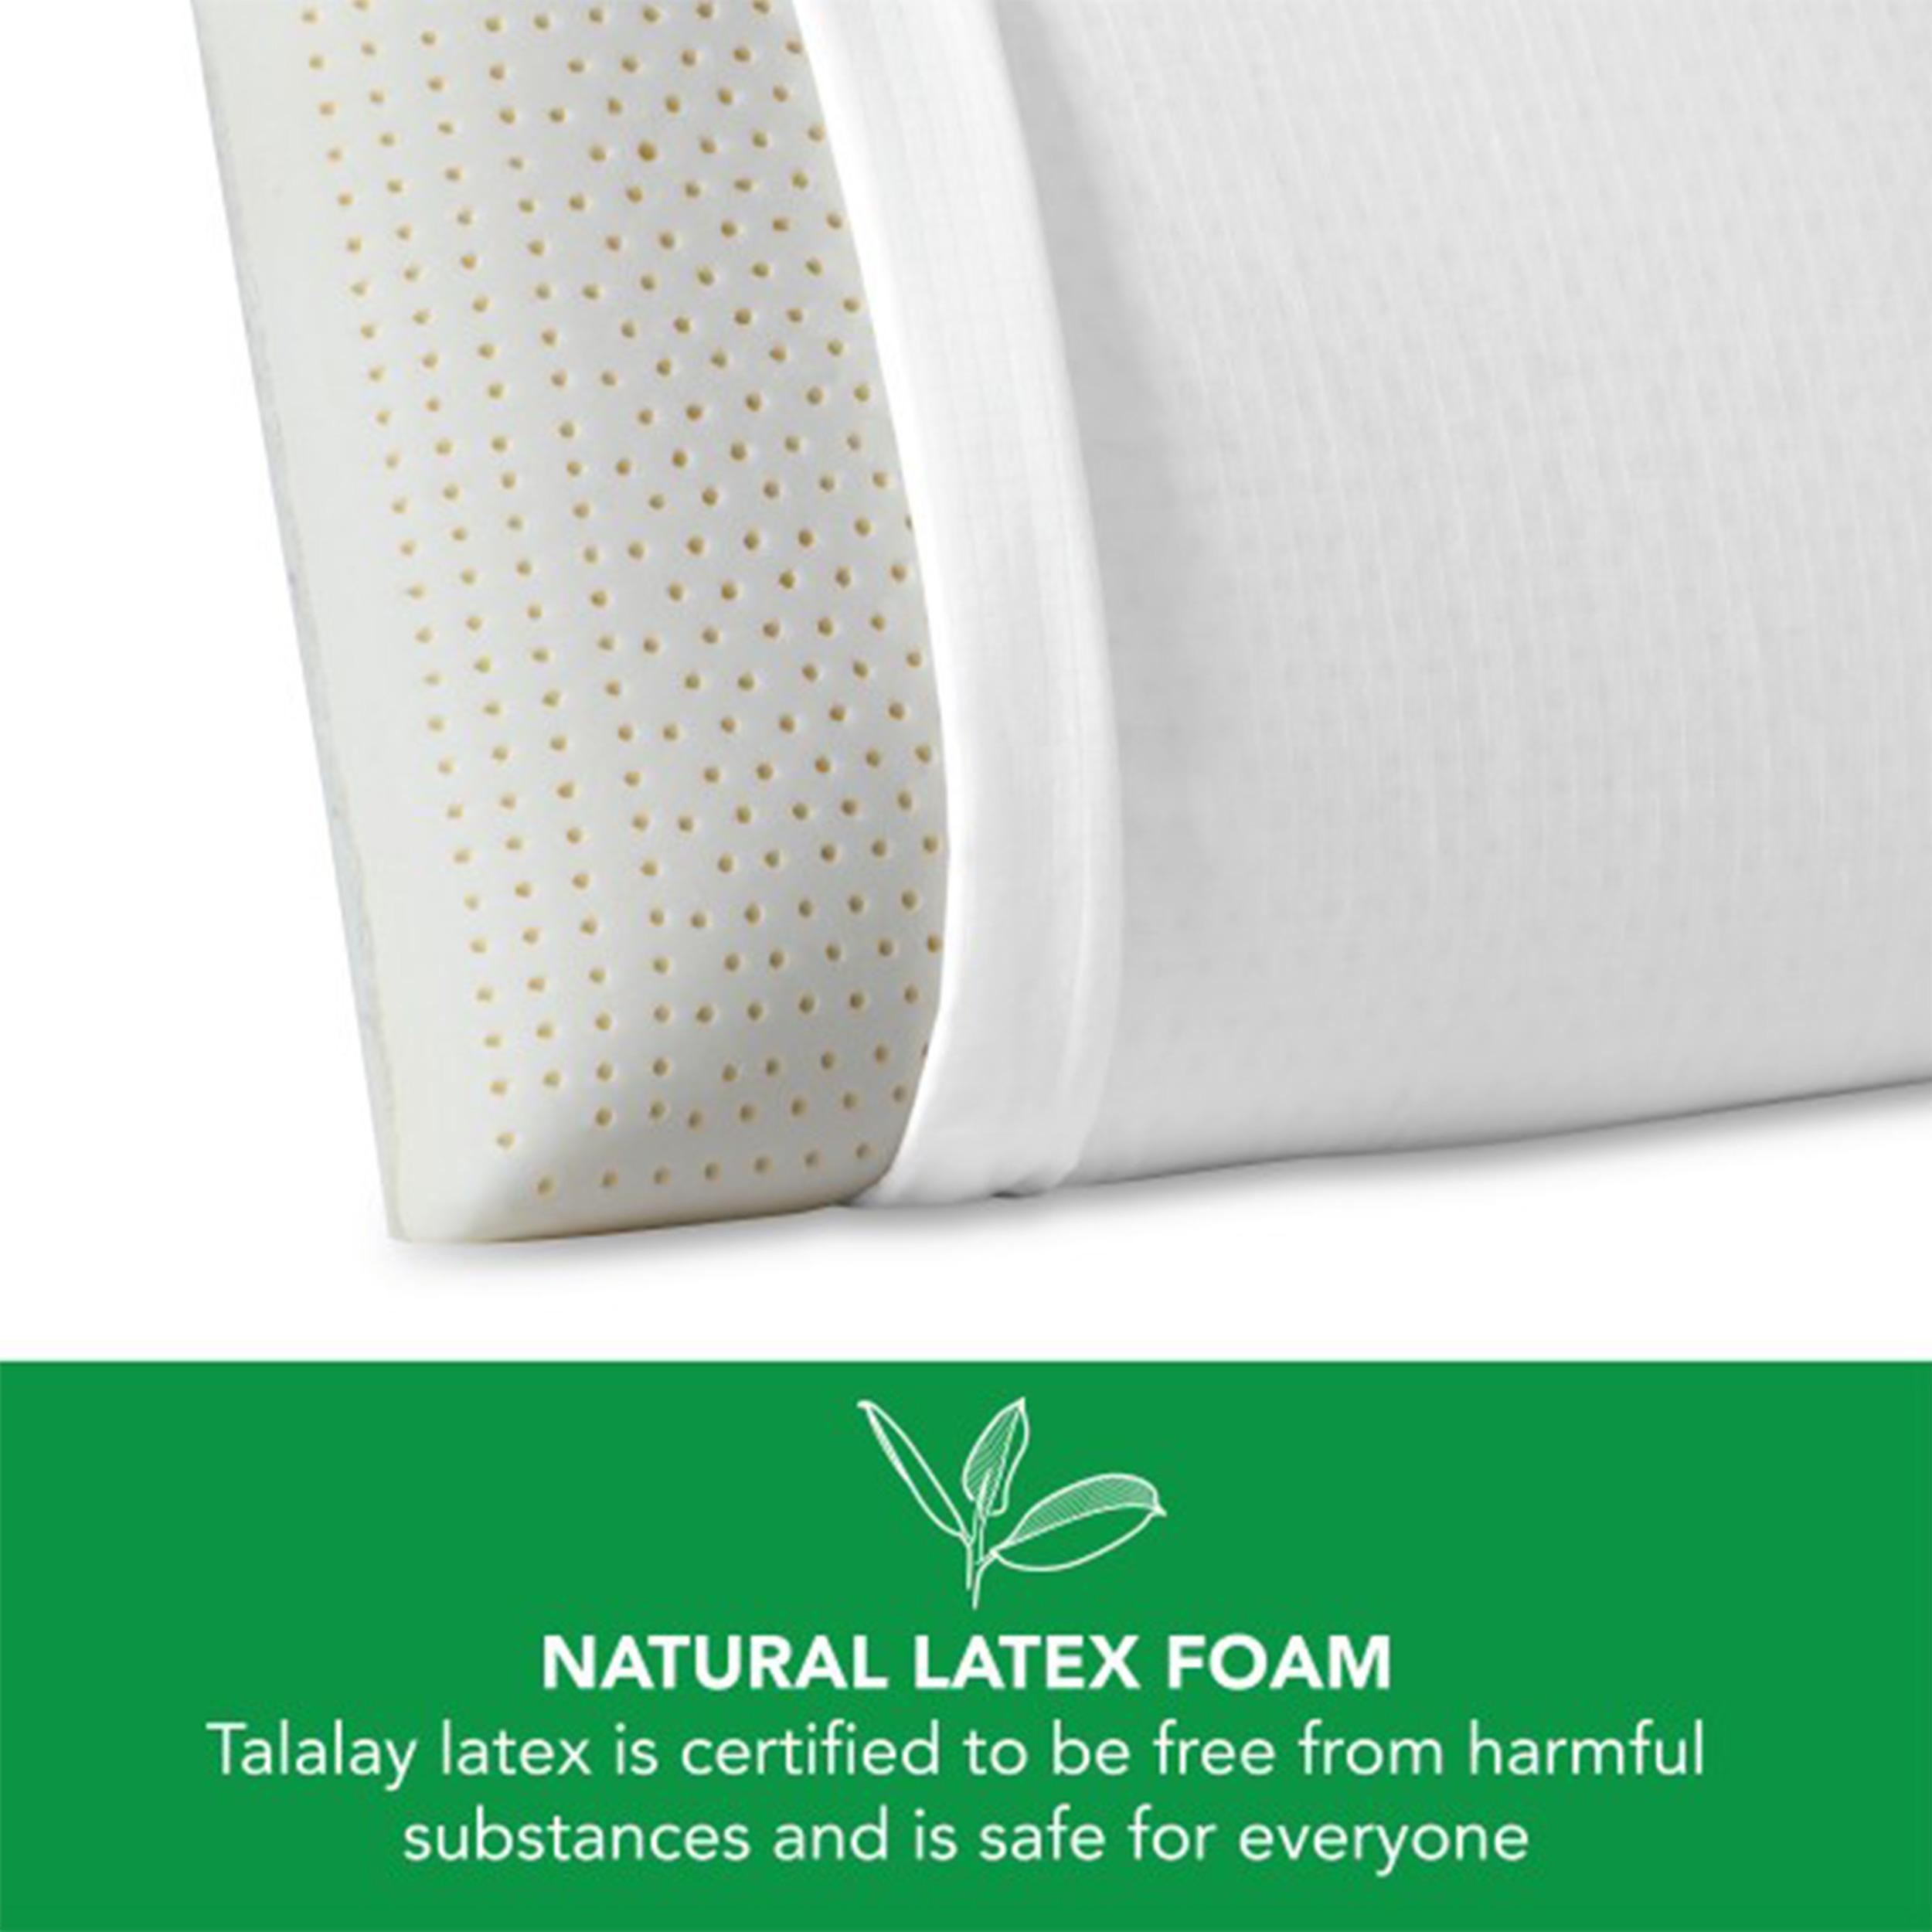 beautyrest latex foam pillow with